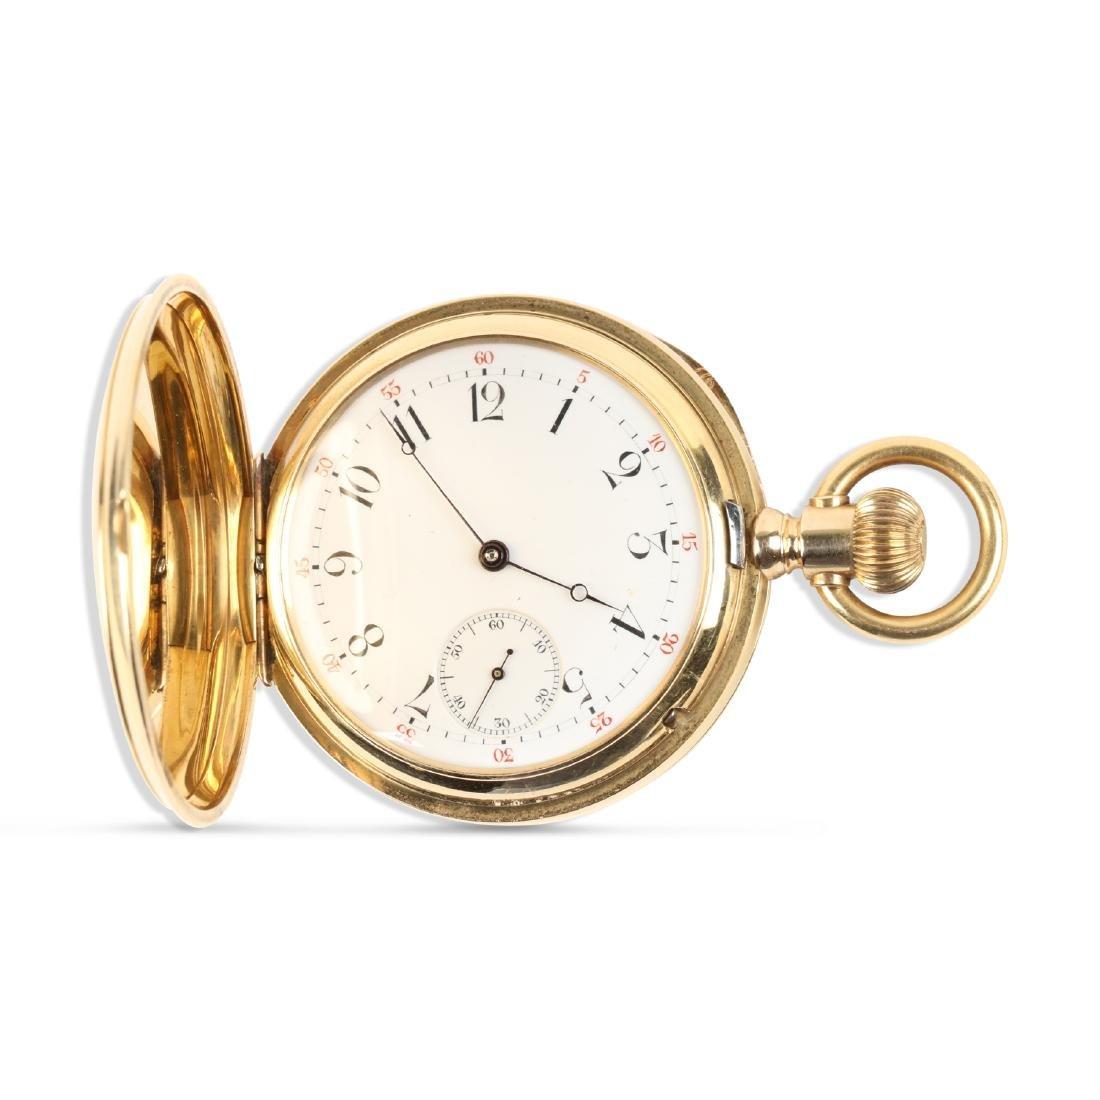 International Watch Co., 18K Gold Pocket Watch